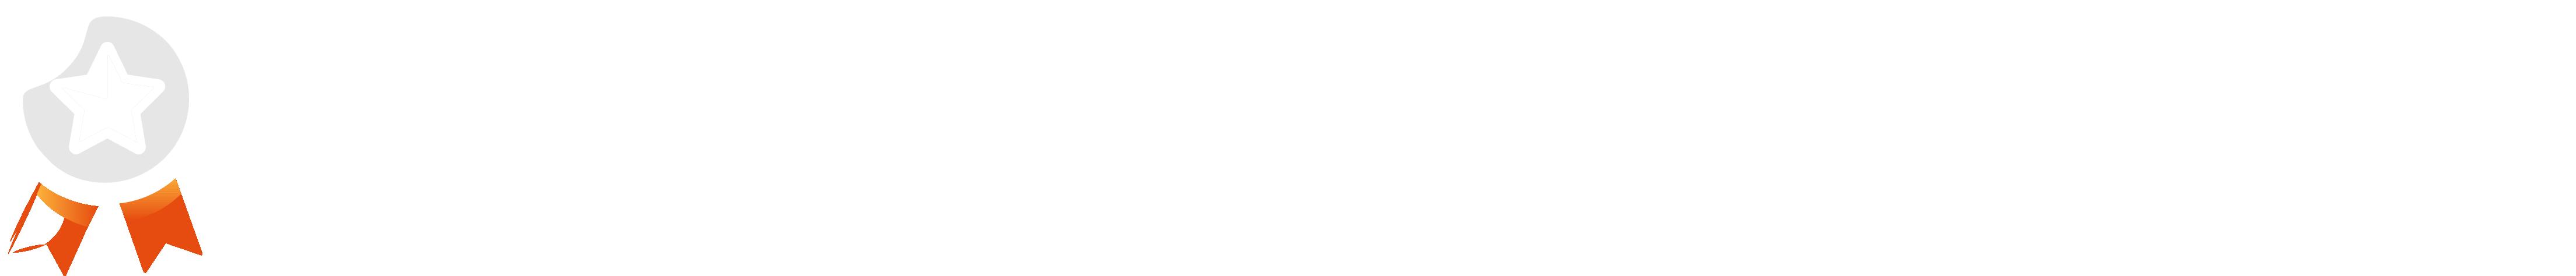 Capsules de Compétences